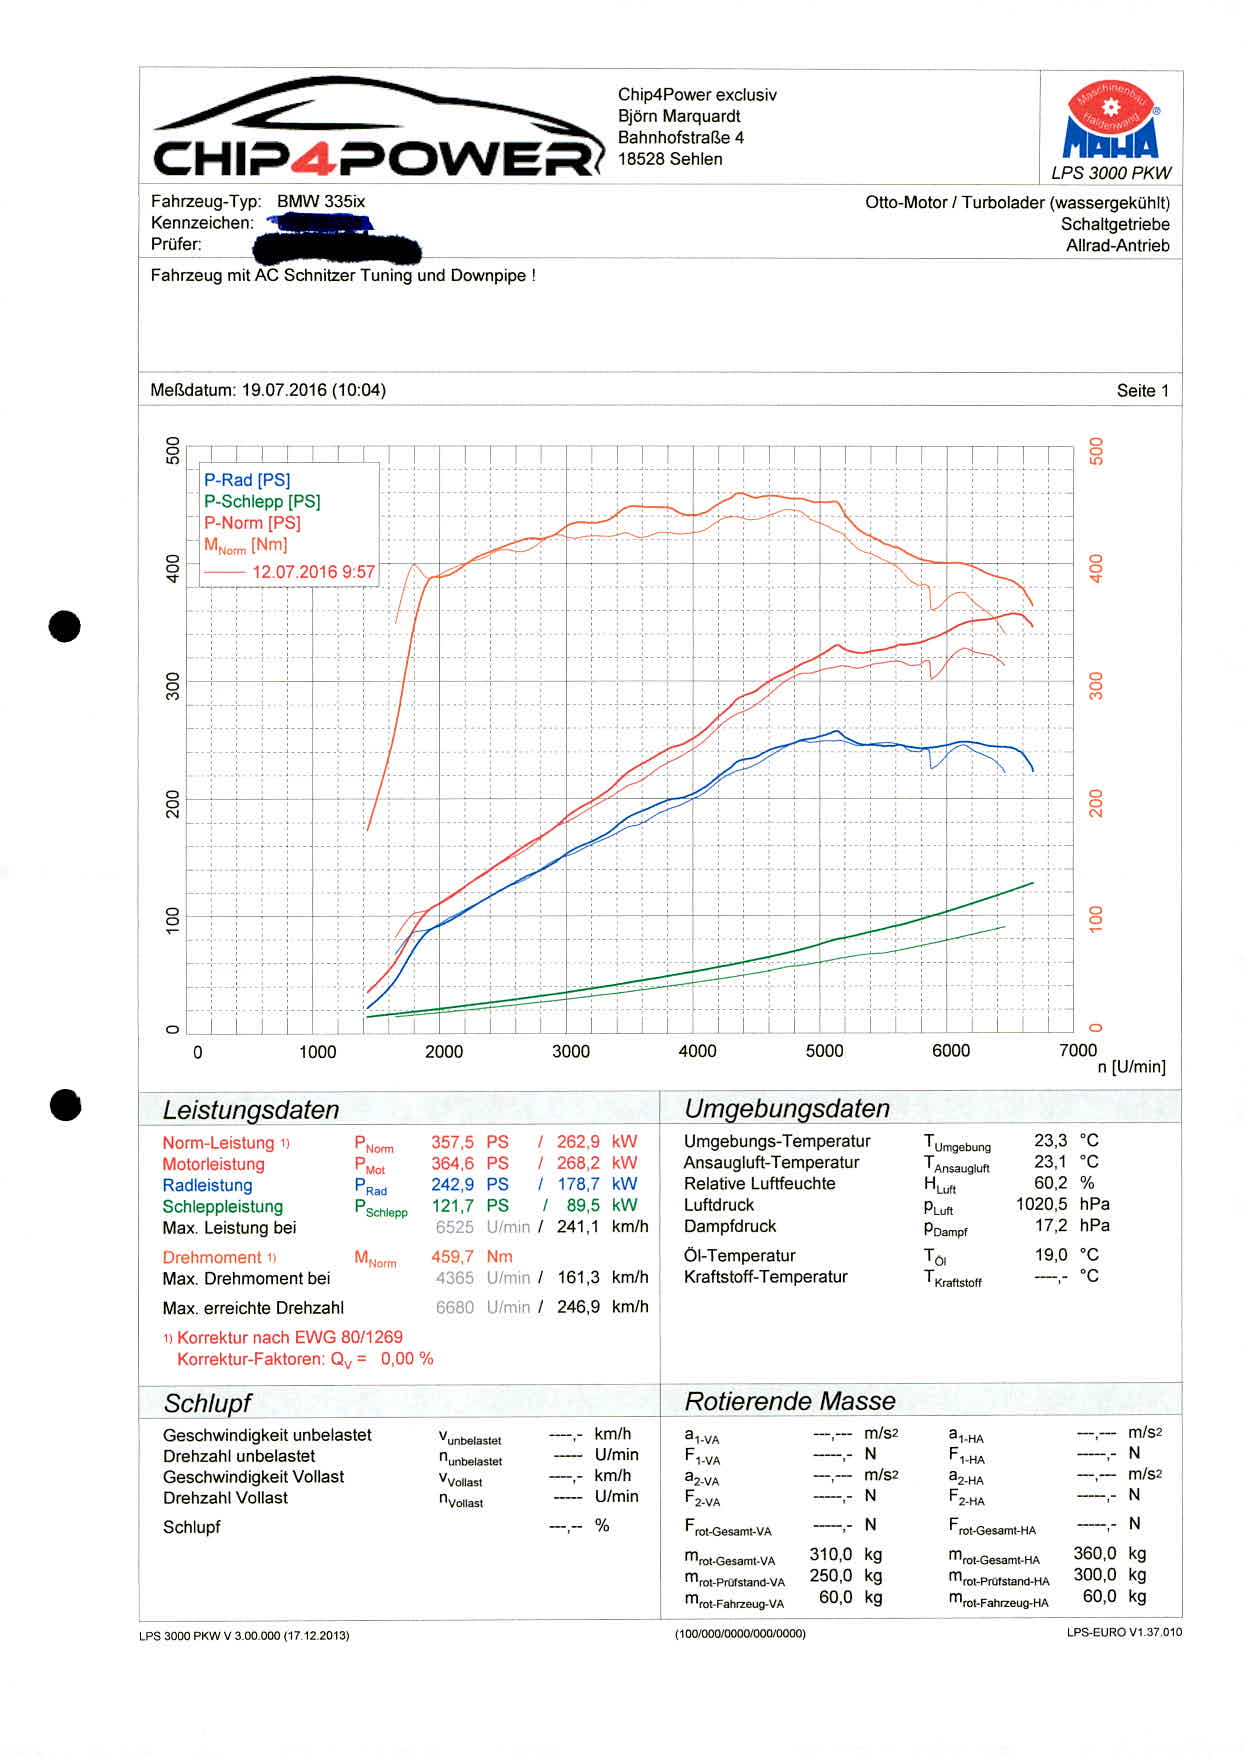 Fein Bmw Servotronic Schaltplan Ideen - Elektrische Schaltplan-Ideen ...